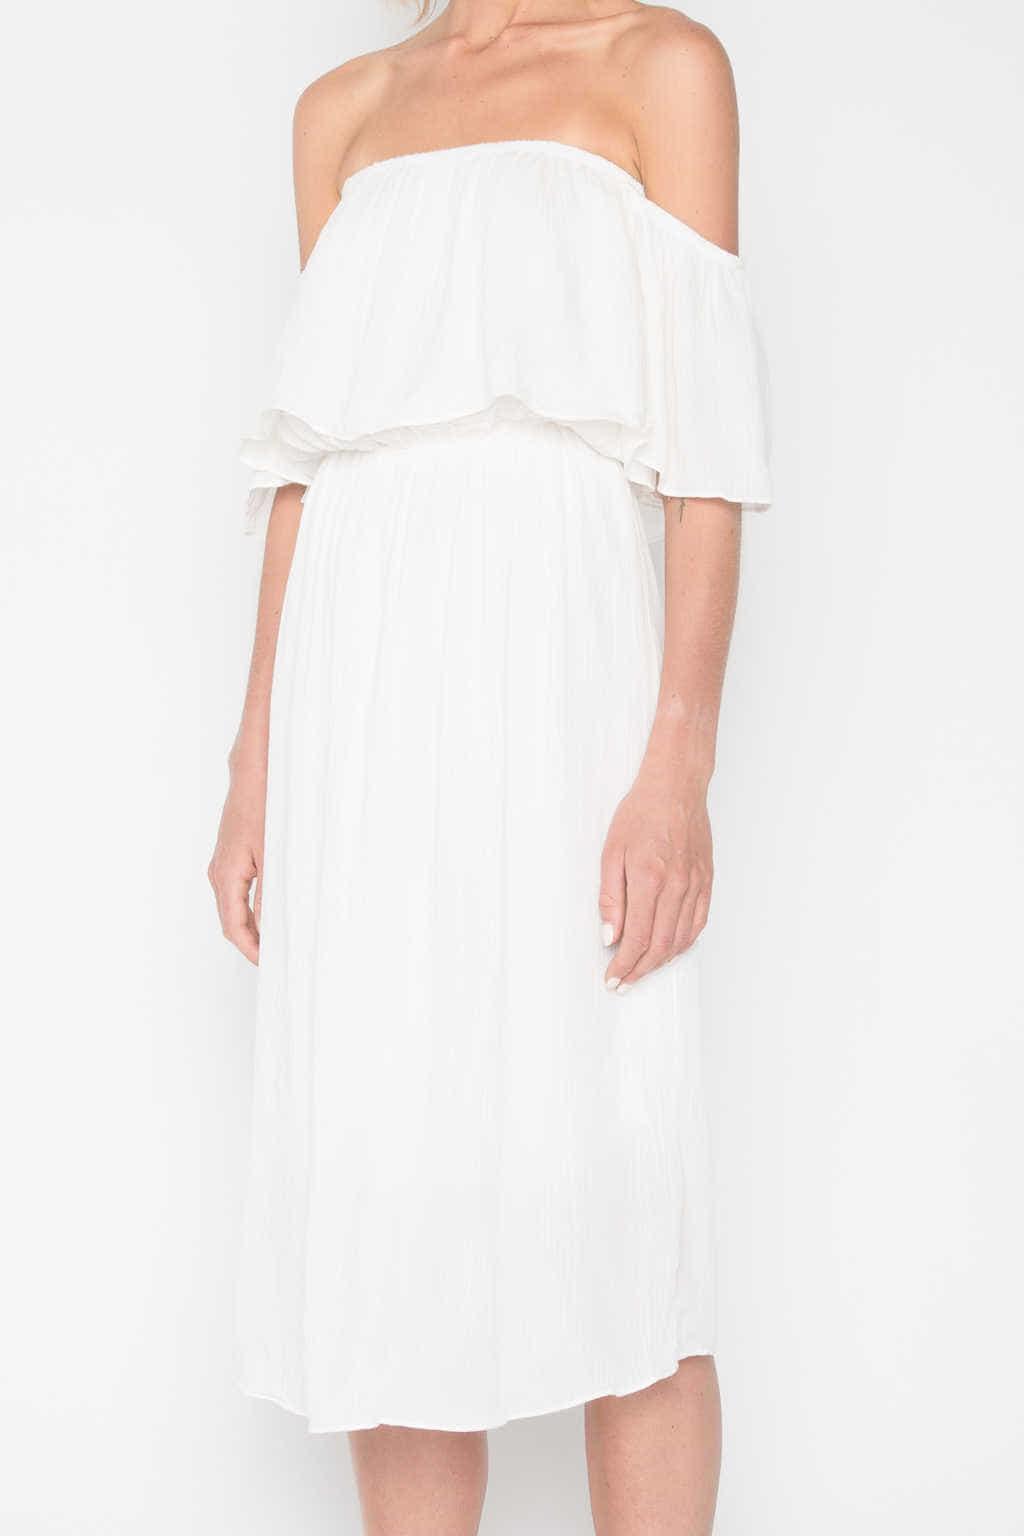 Dress H200 Cream 2